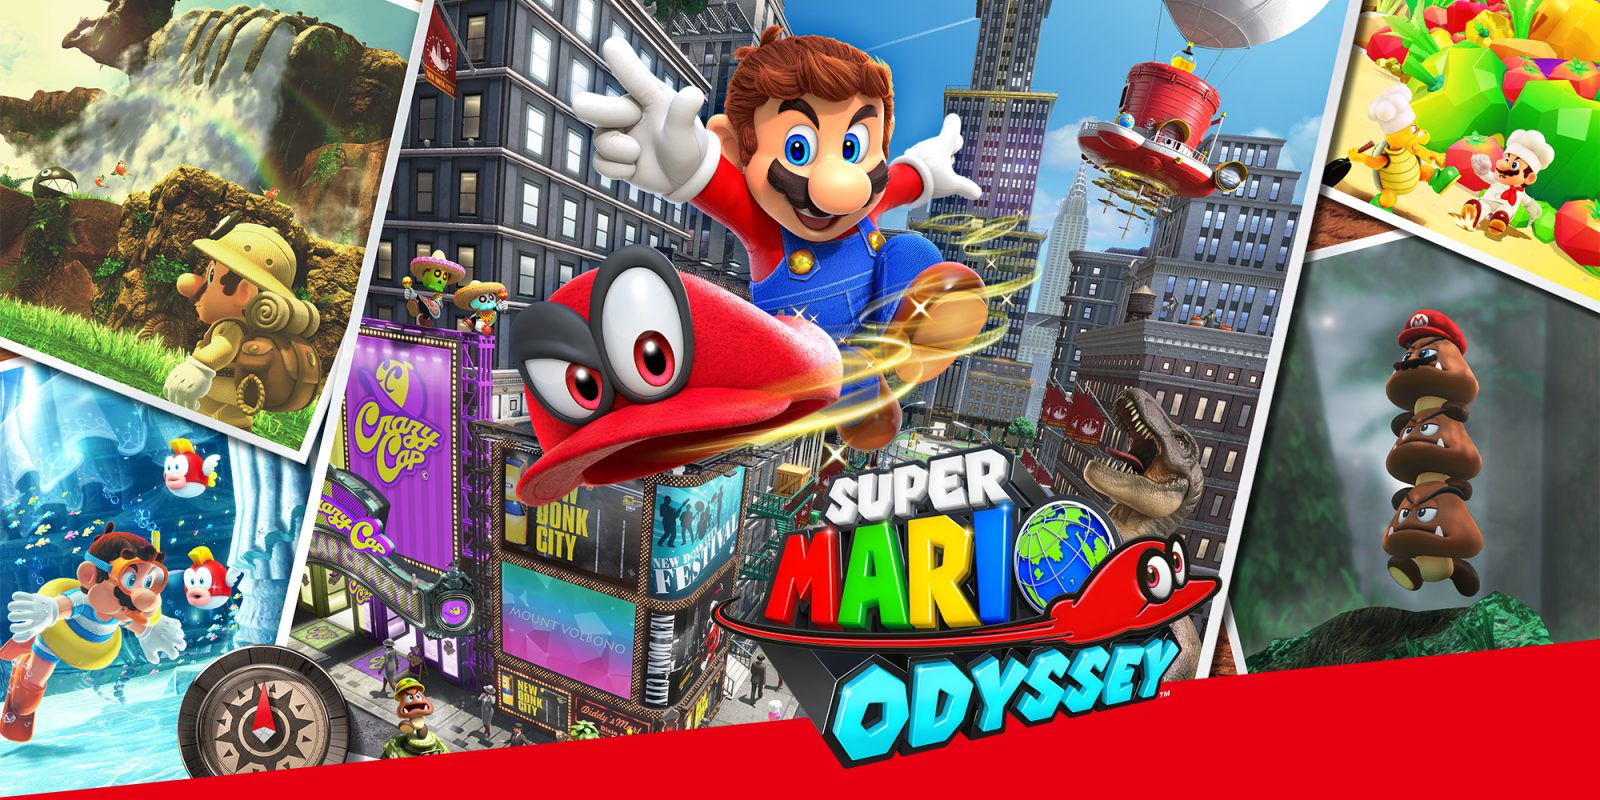 How To Draw Super Mario Super Mario Odyssey Art In 2019